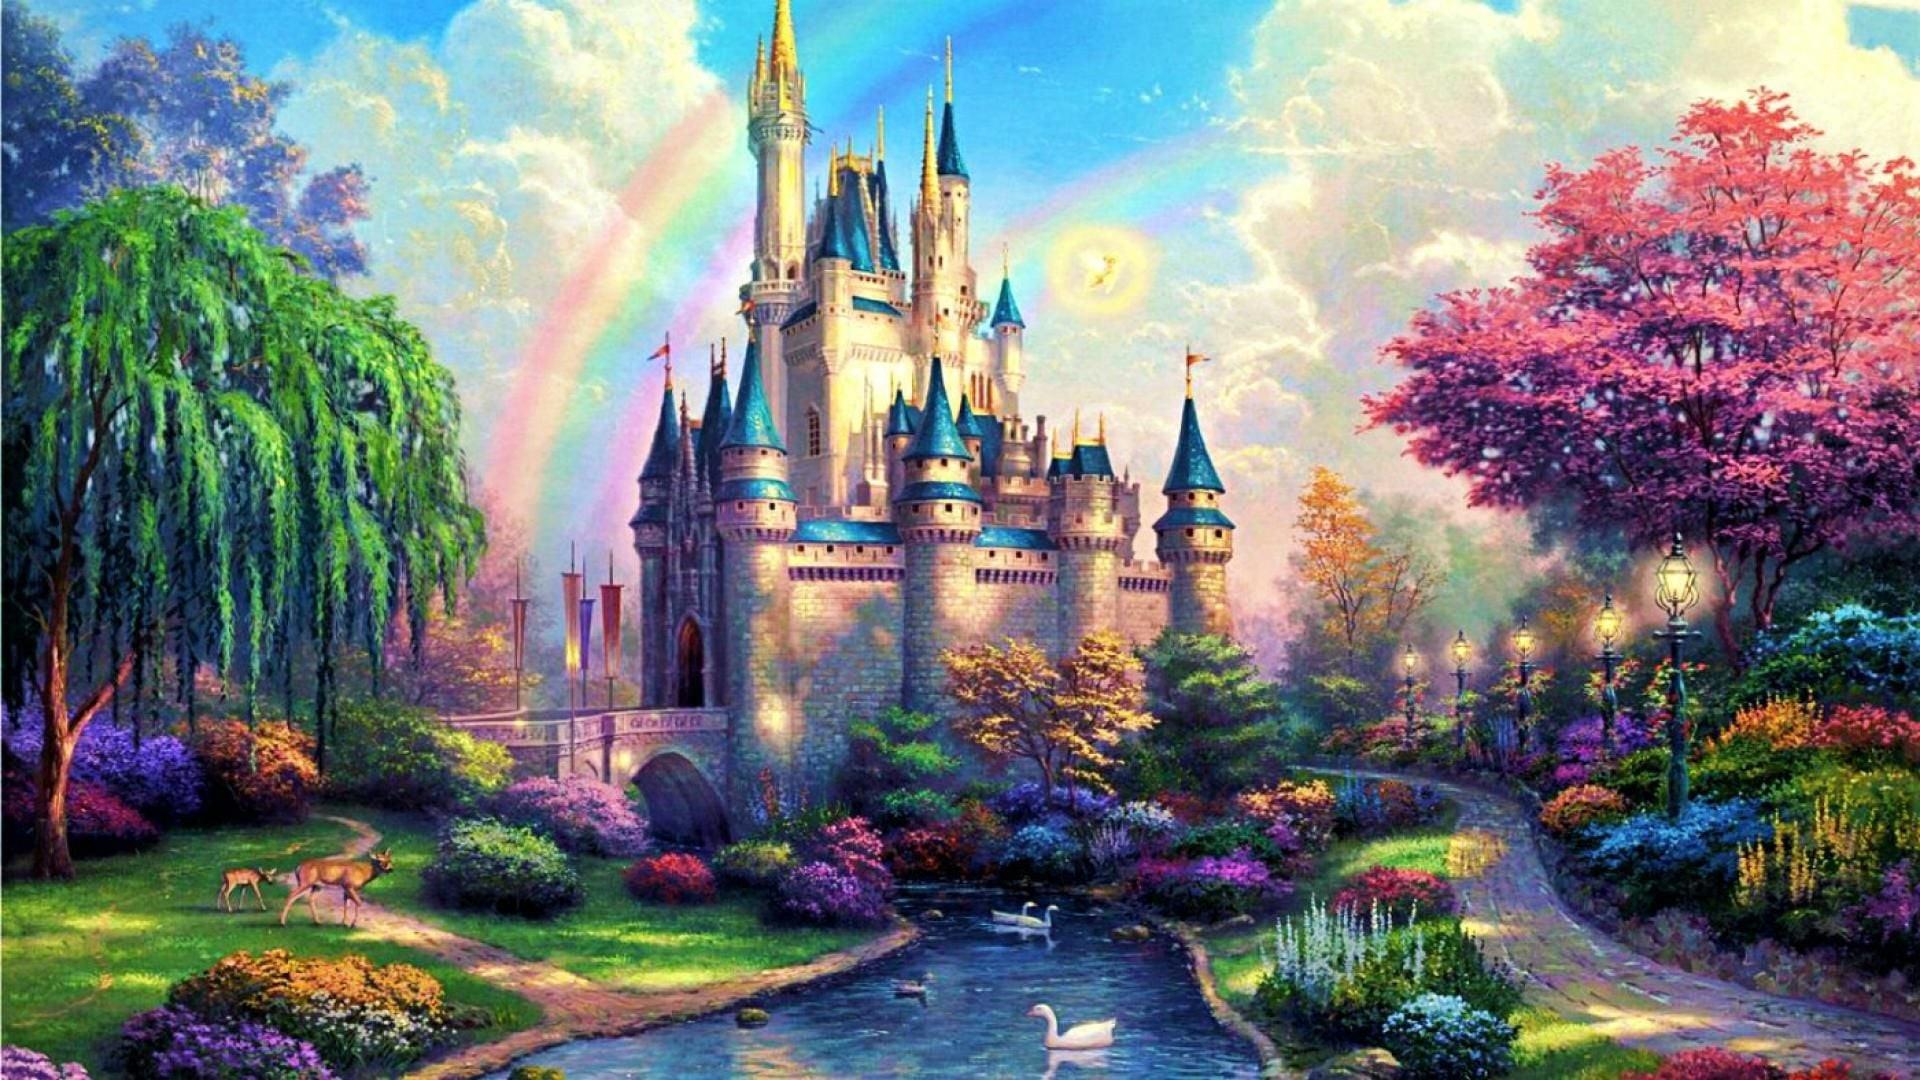 24 Wallpaper Hd Fairyland Wallpaper 79 Images